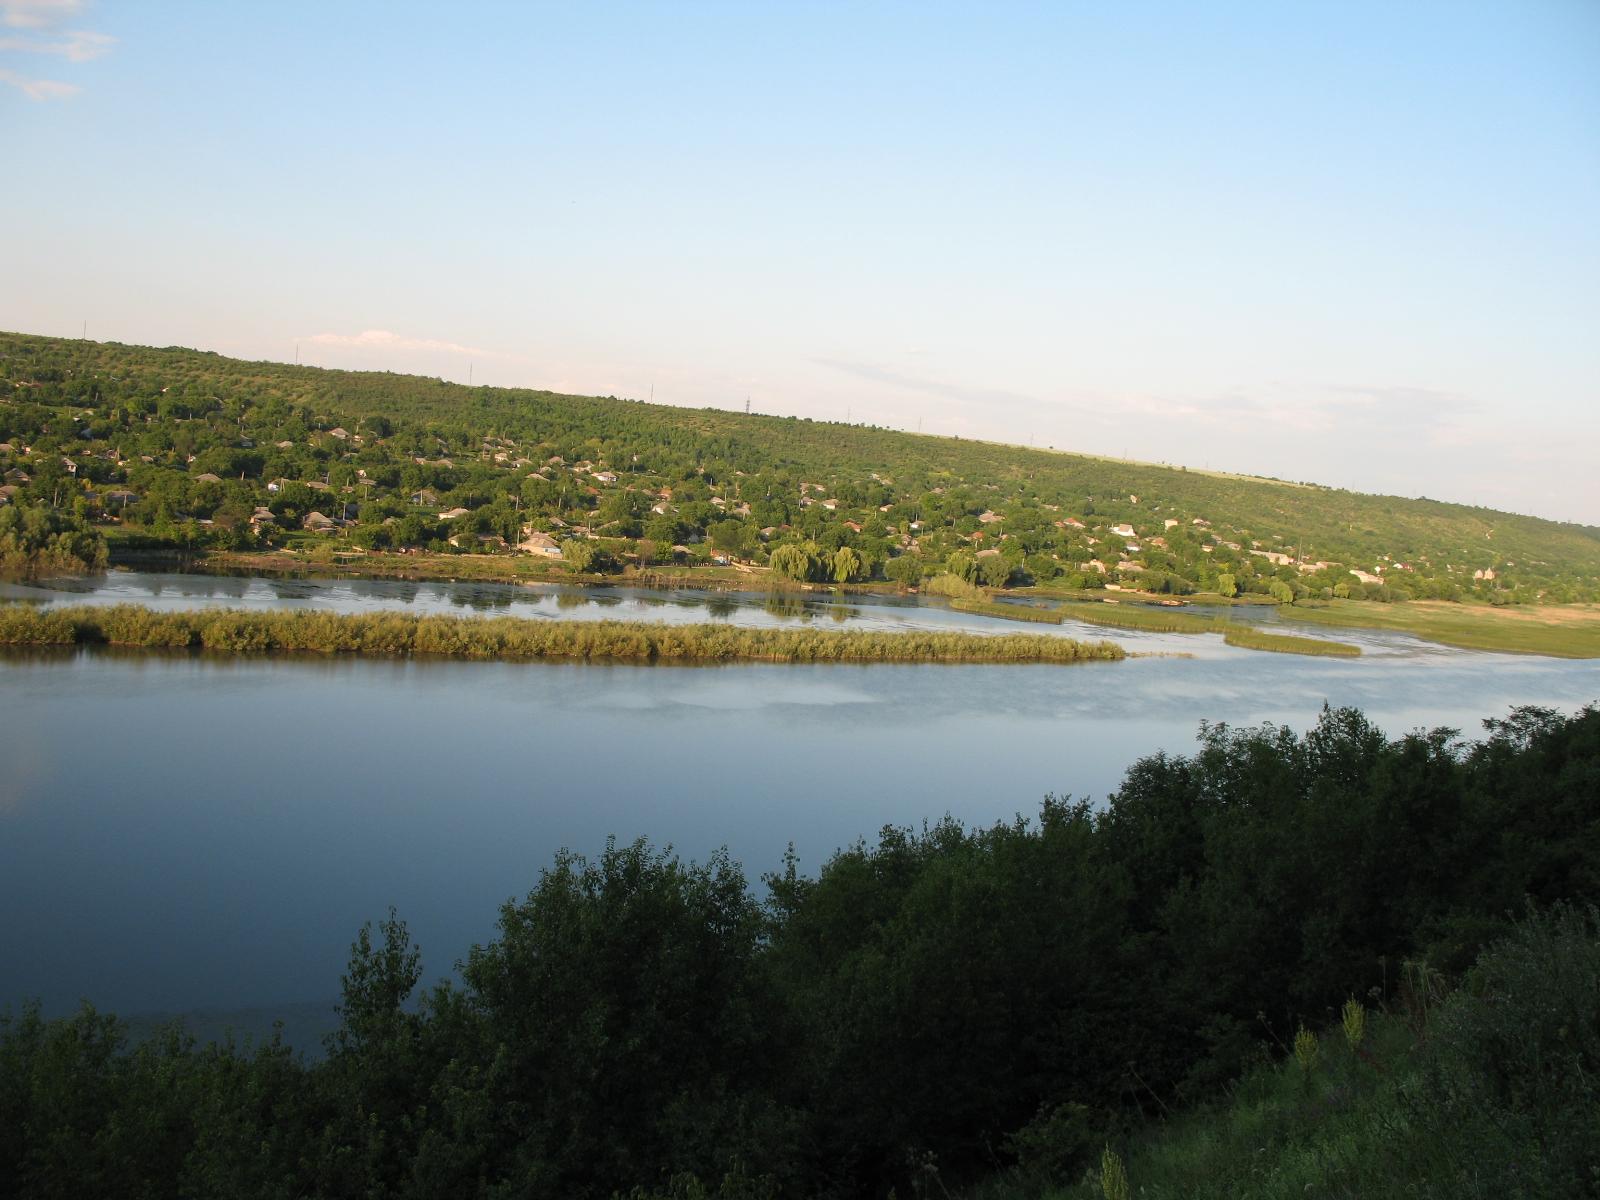 File:Dniester river near Popenki.jpg - Wikimedia Commons